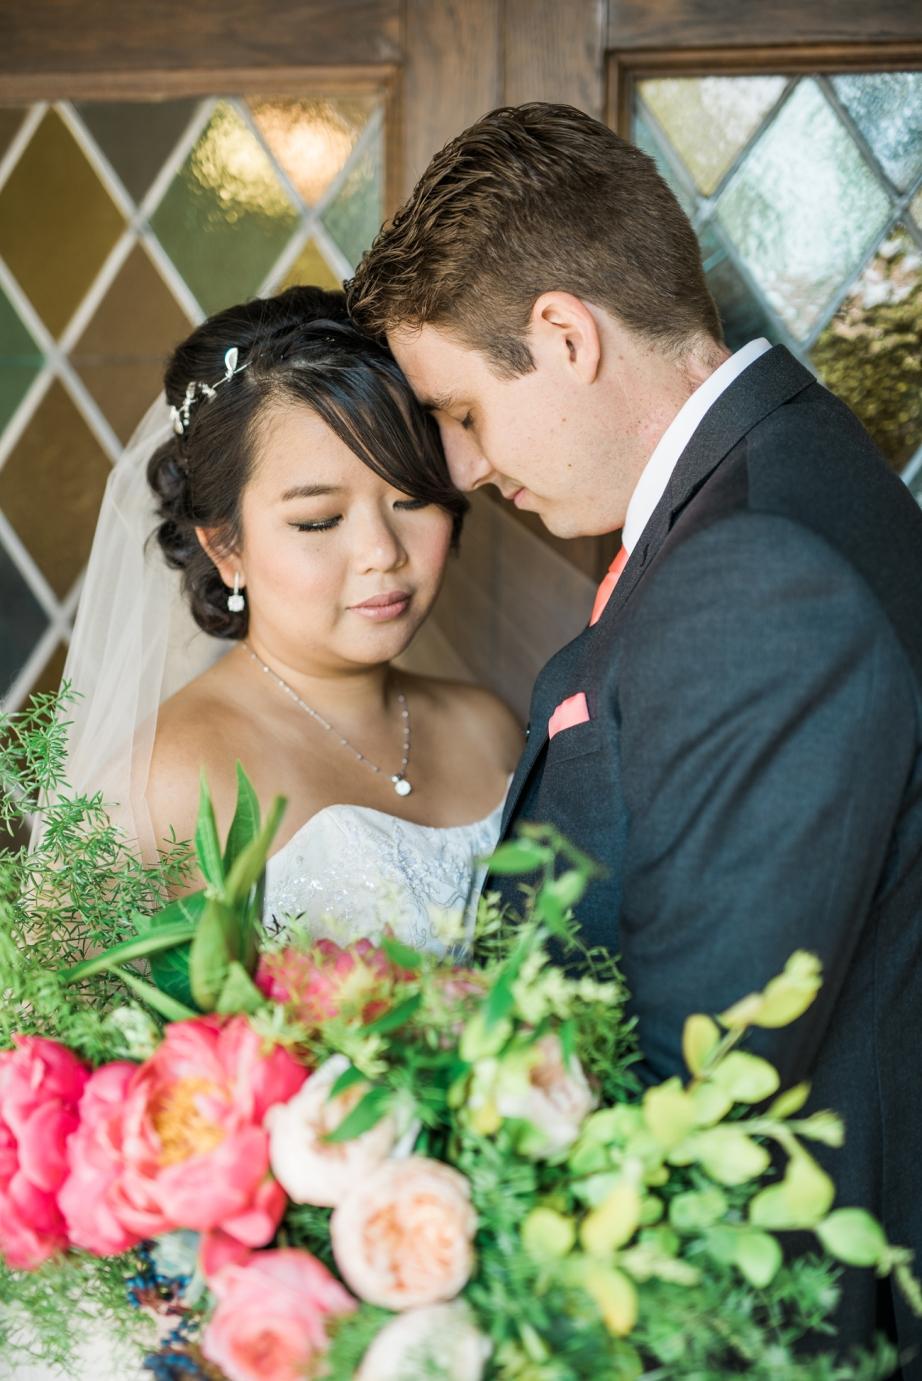 st-marks-episcopal-church-wedding-photo-028